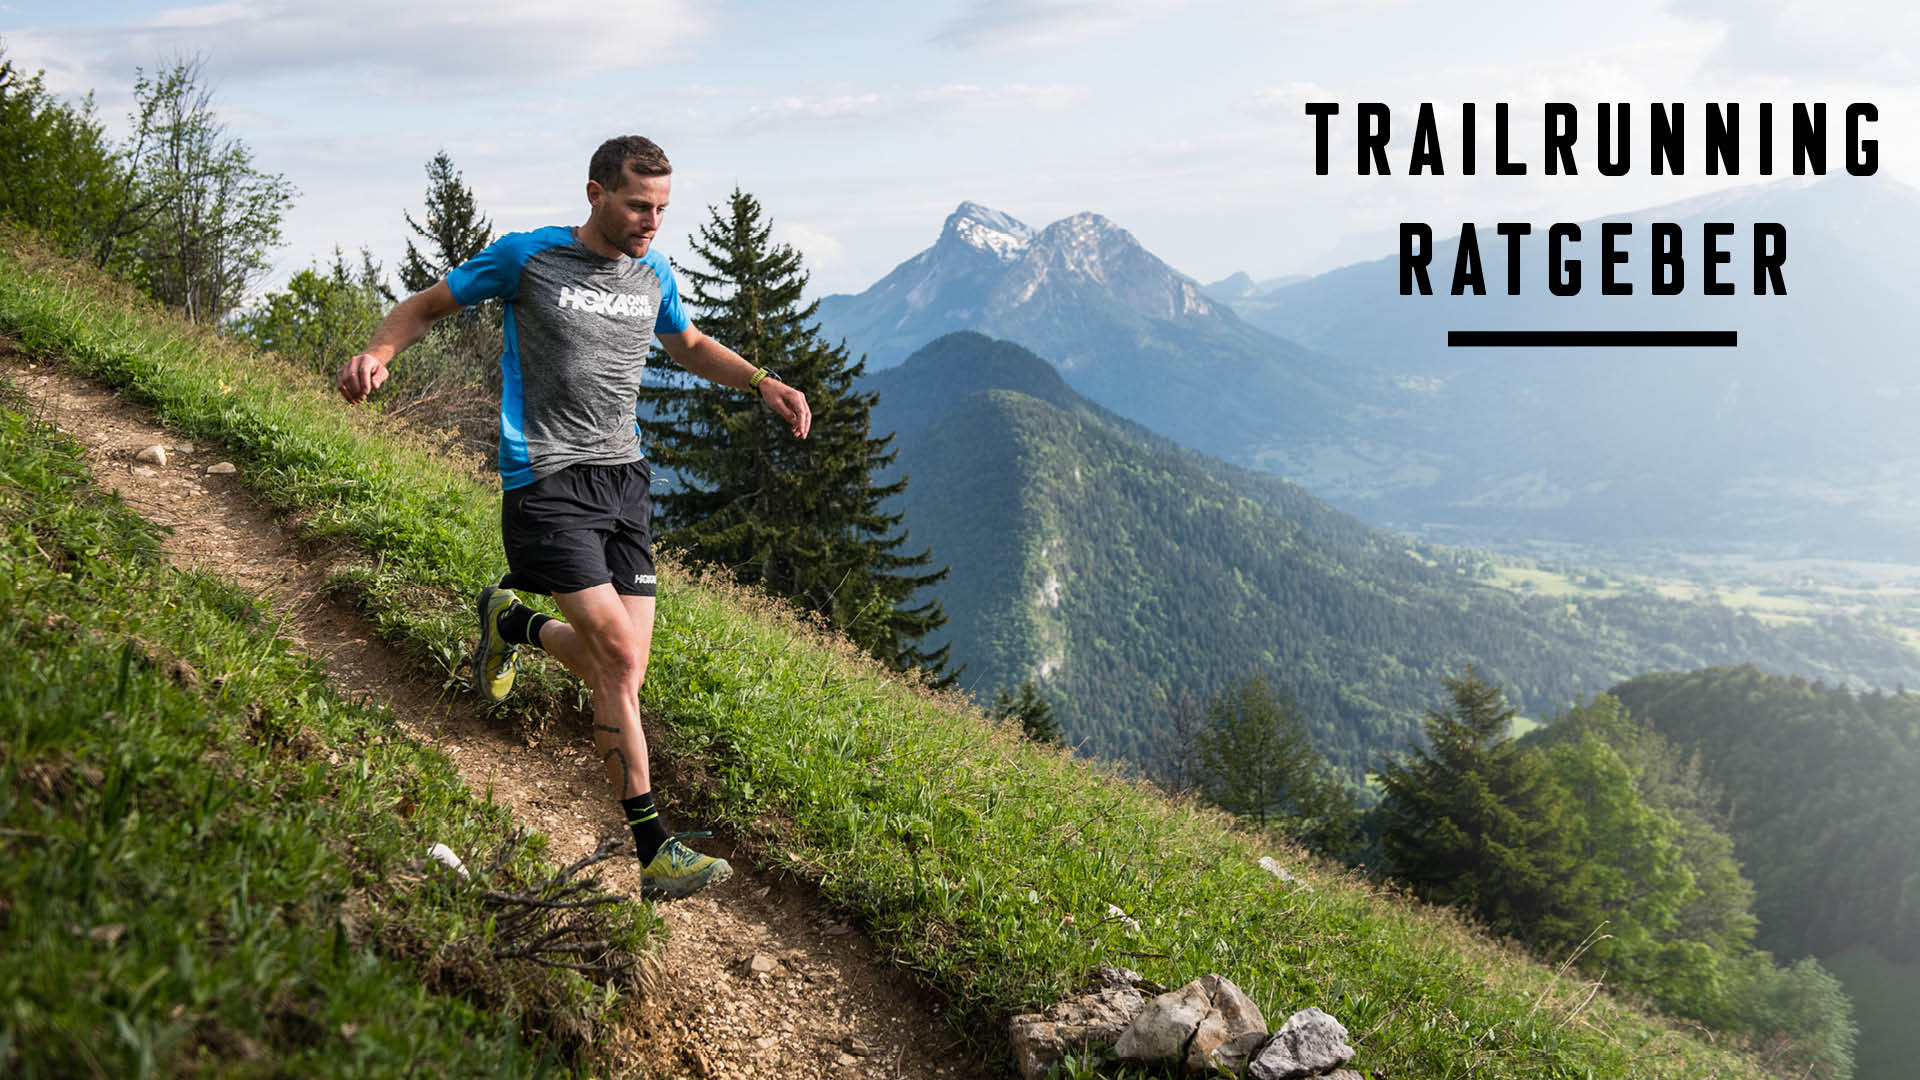 16x9_Trailrunning-Ratgeber